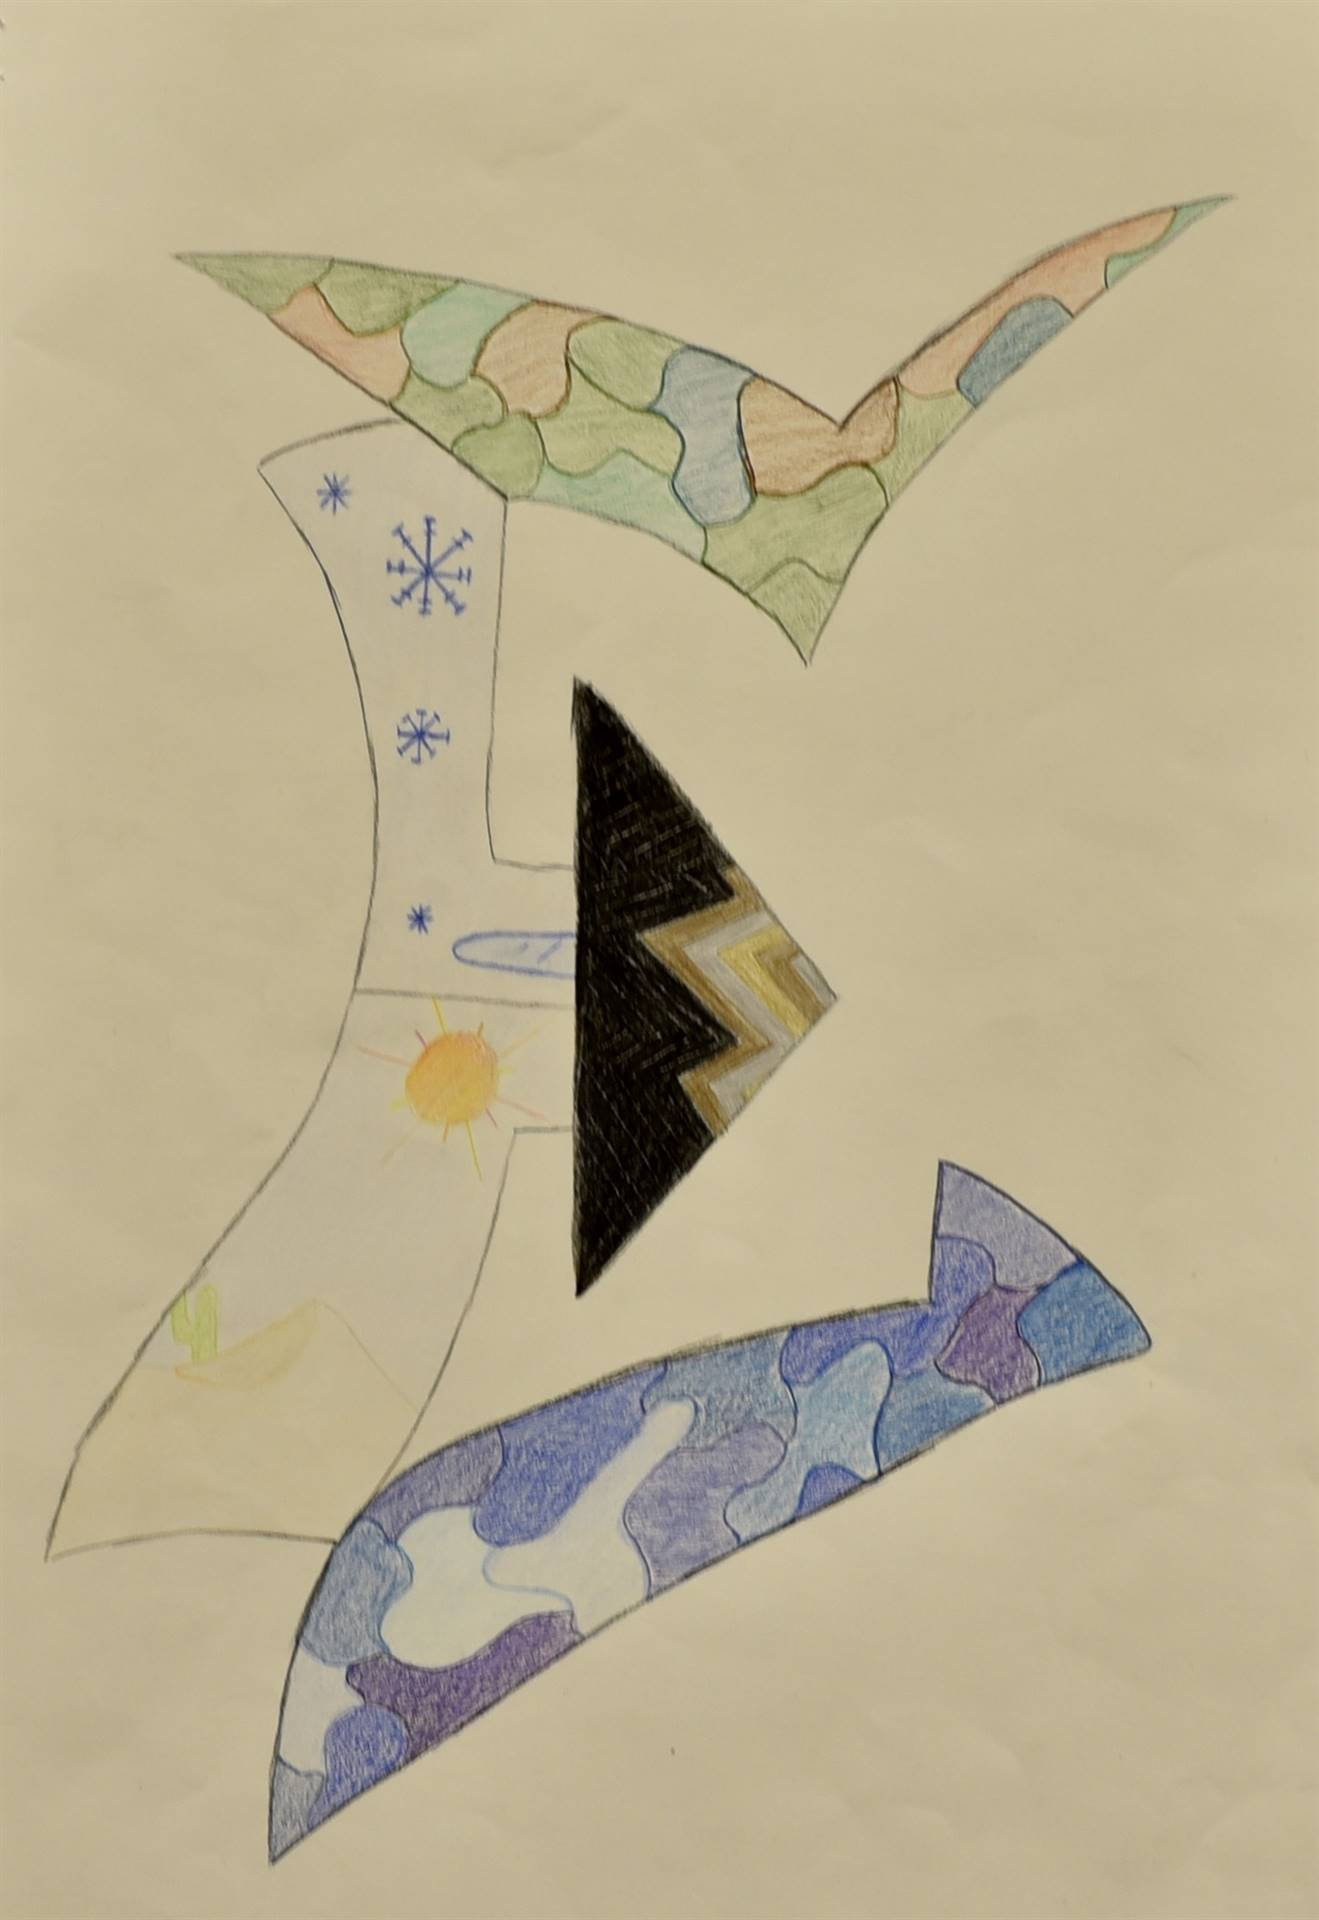 Brecksville-Broadview Hts. Middle School Art Projects 60